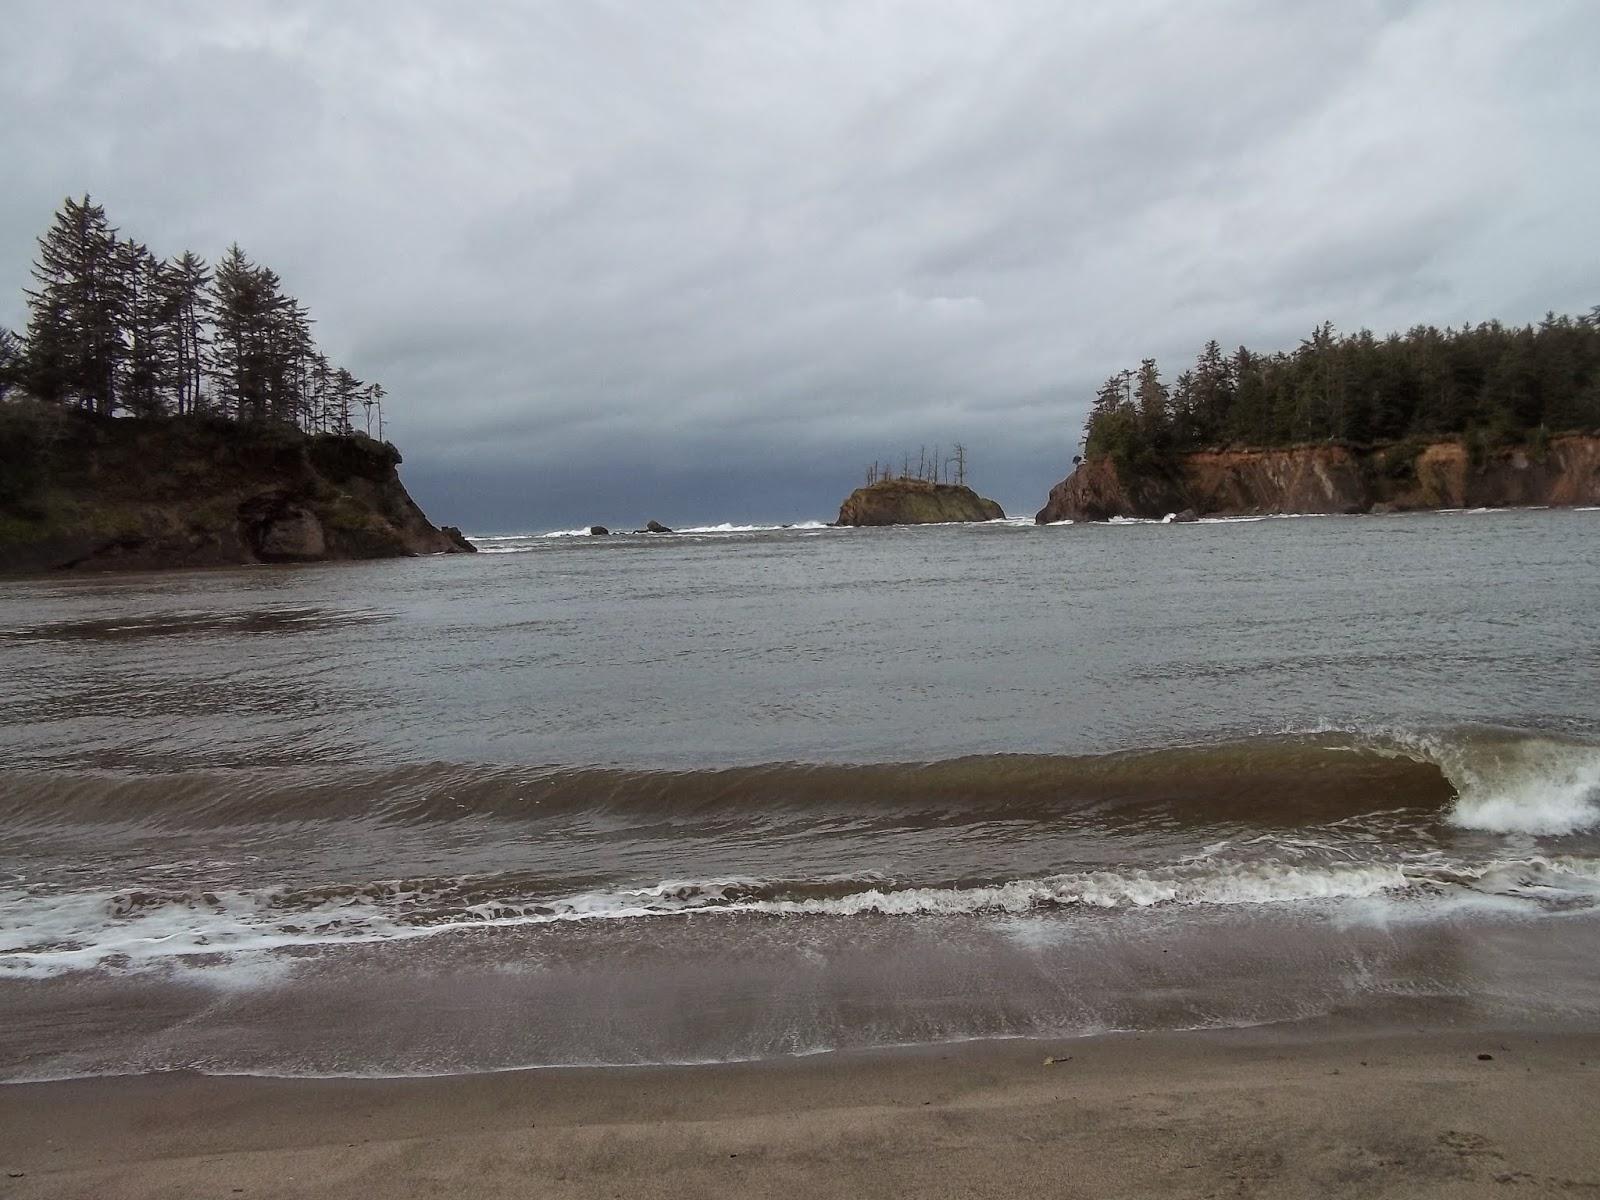 Casing Oregon Late Winter Camping On The Oregon Coast